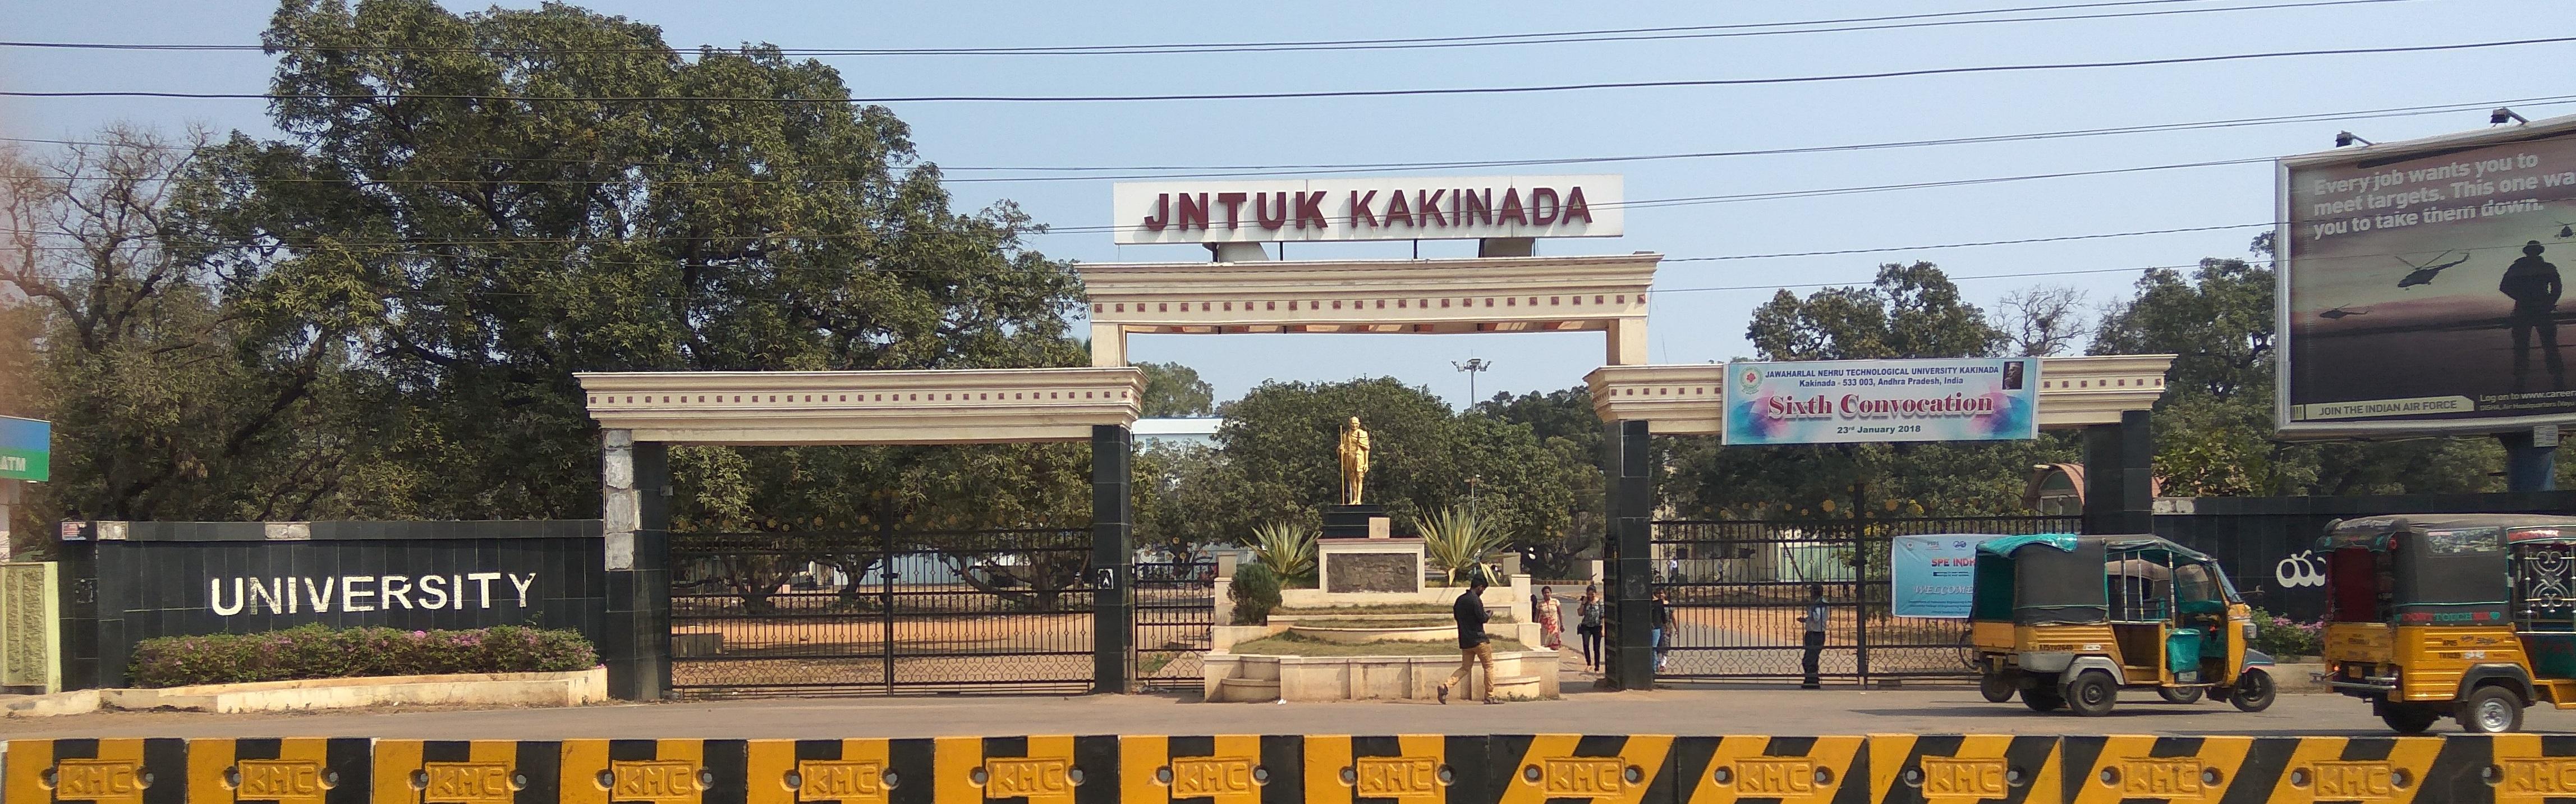 JNTU (Jawaharlal Nehru Technological University), Kakinada